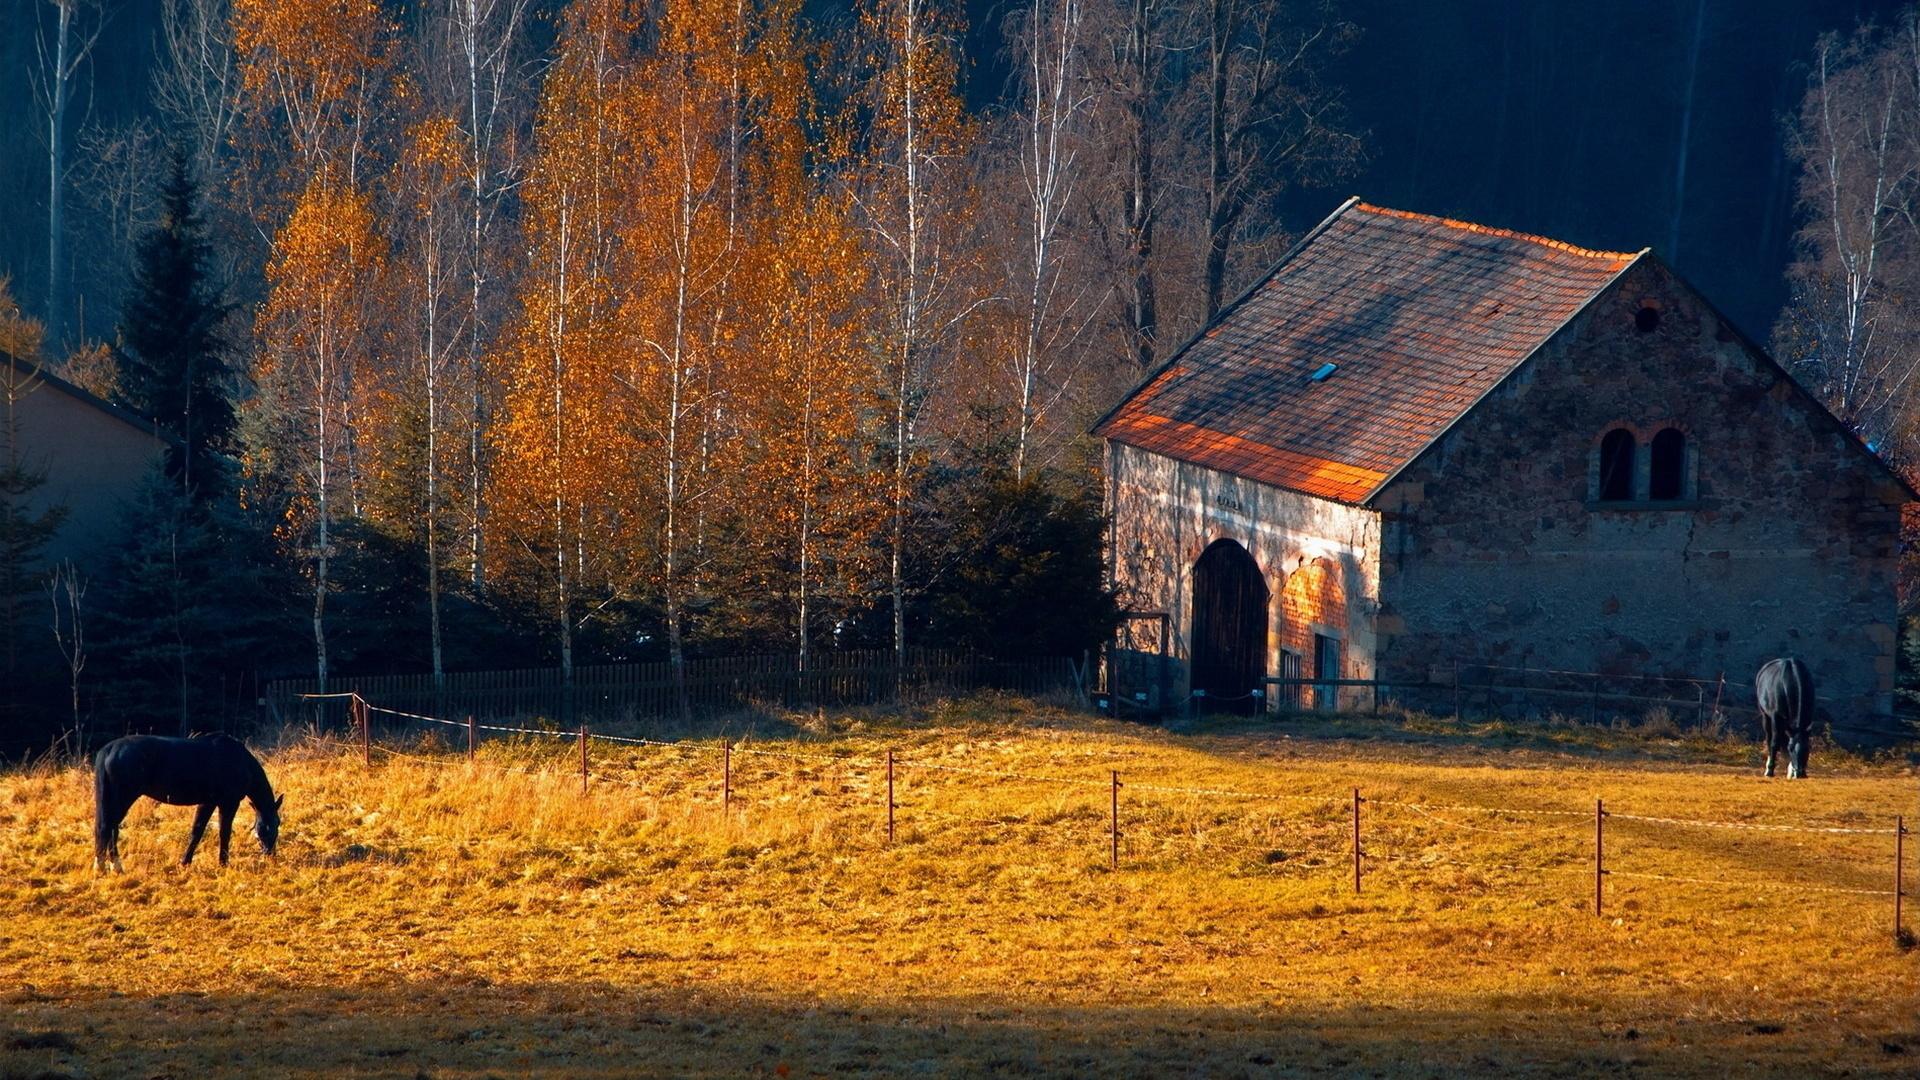 farm barn landscapes buildings autumn fall trees wallpaper background 1920x1080